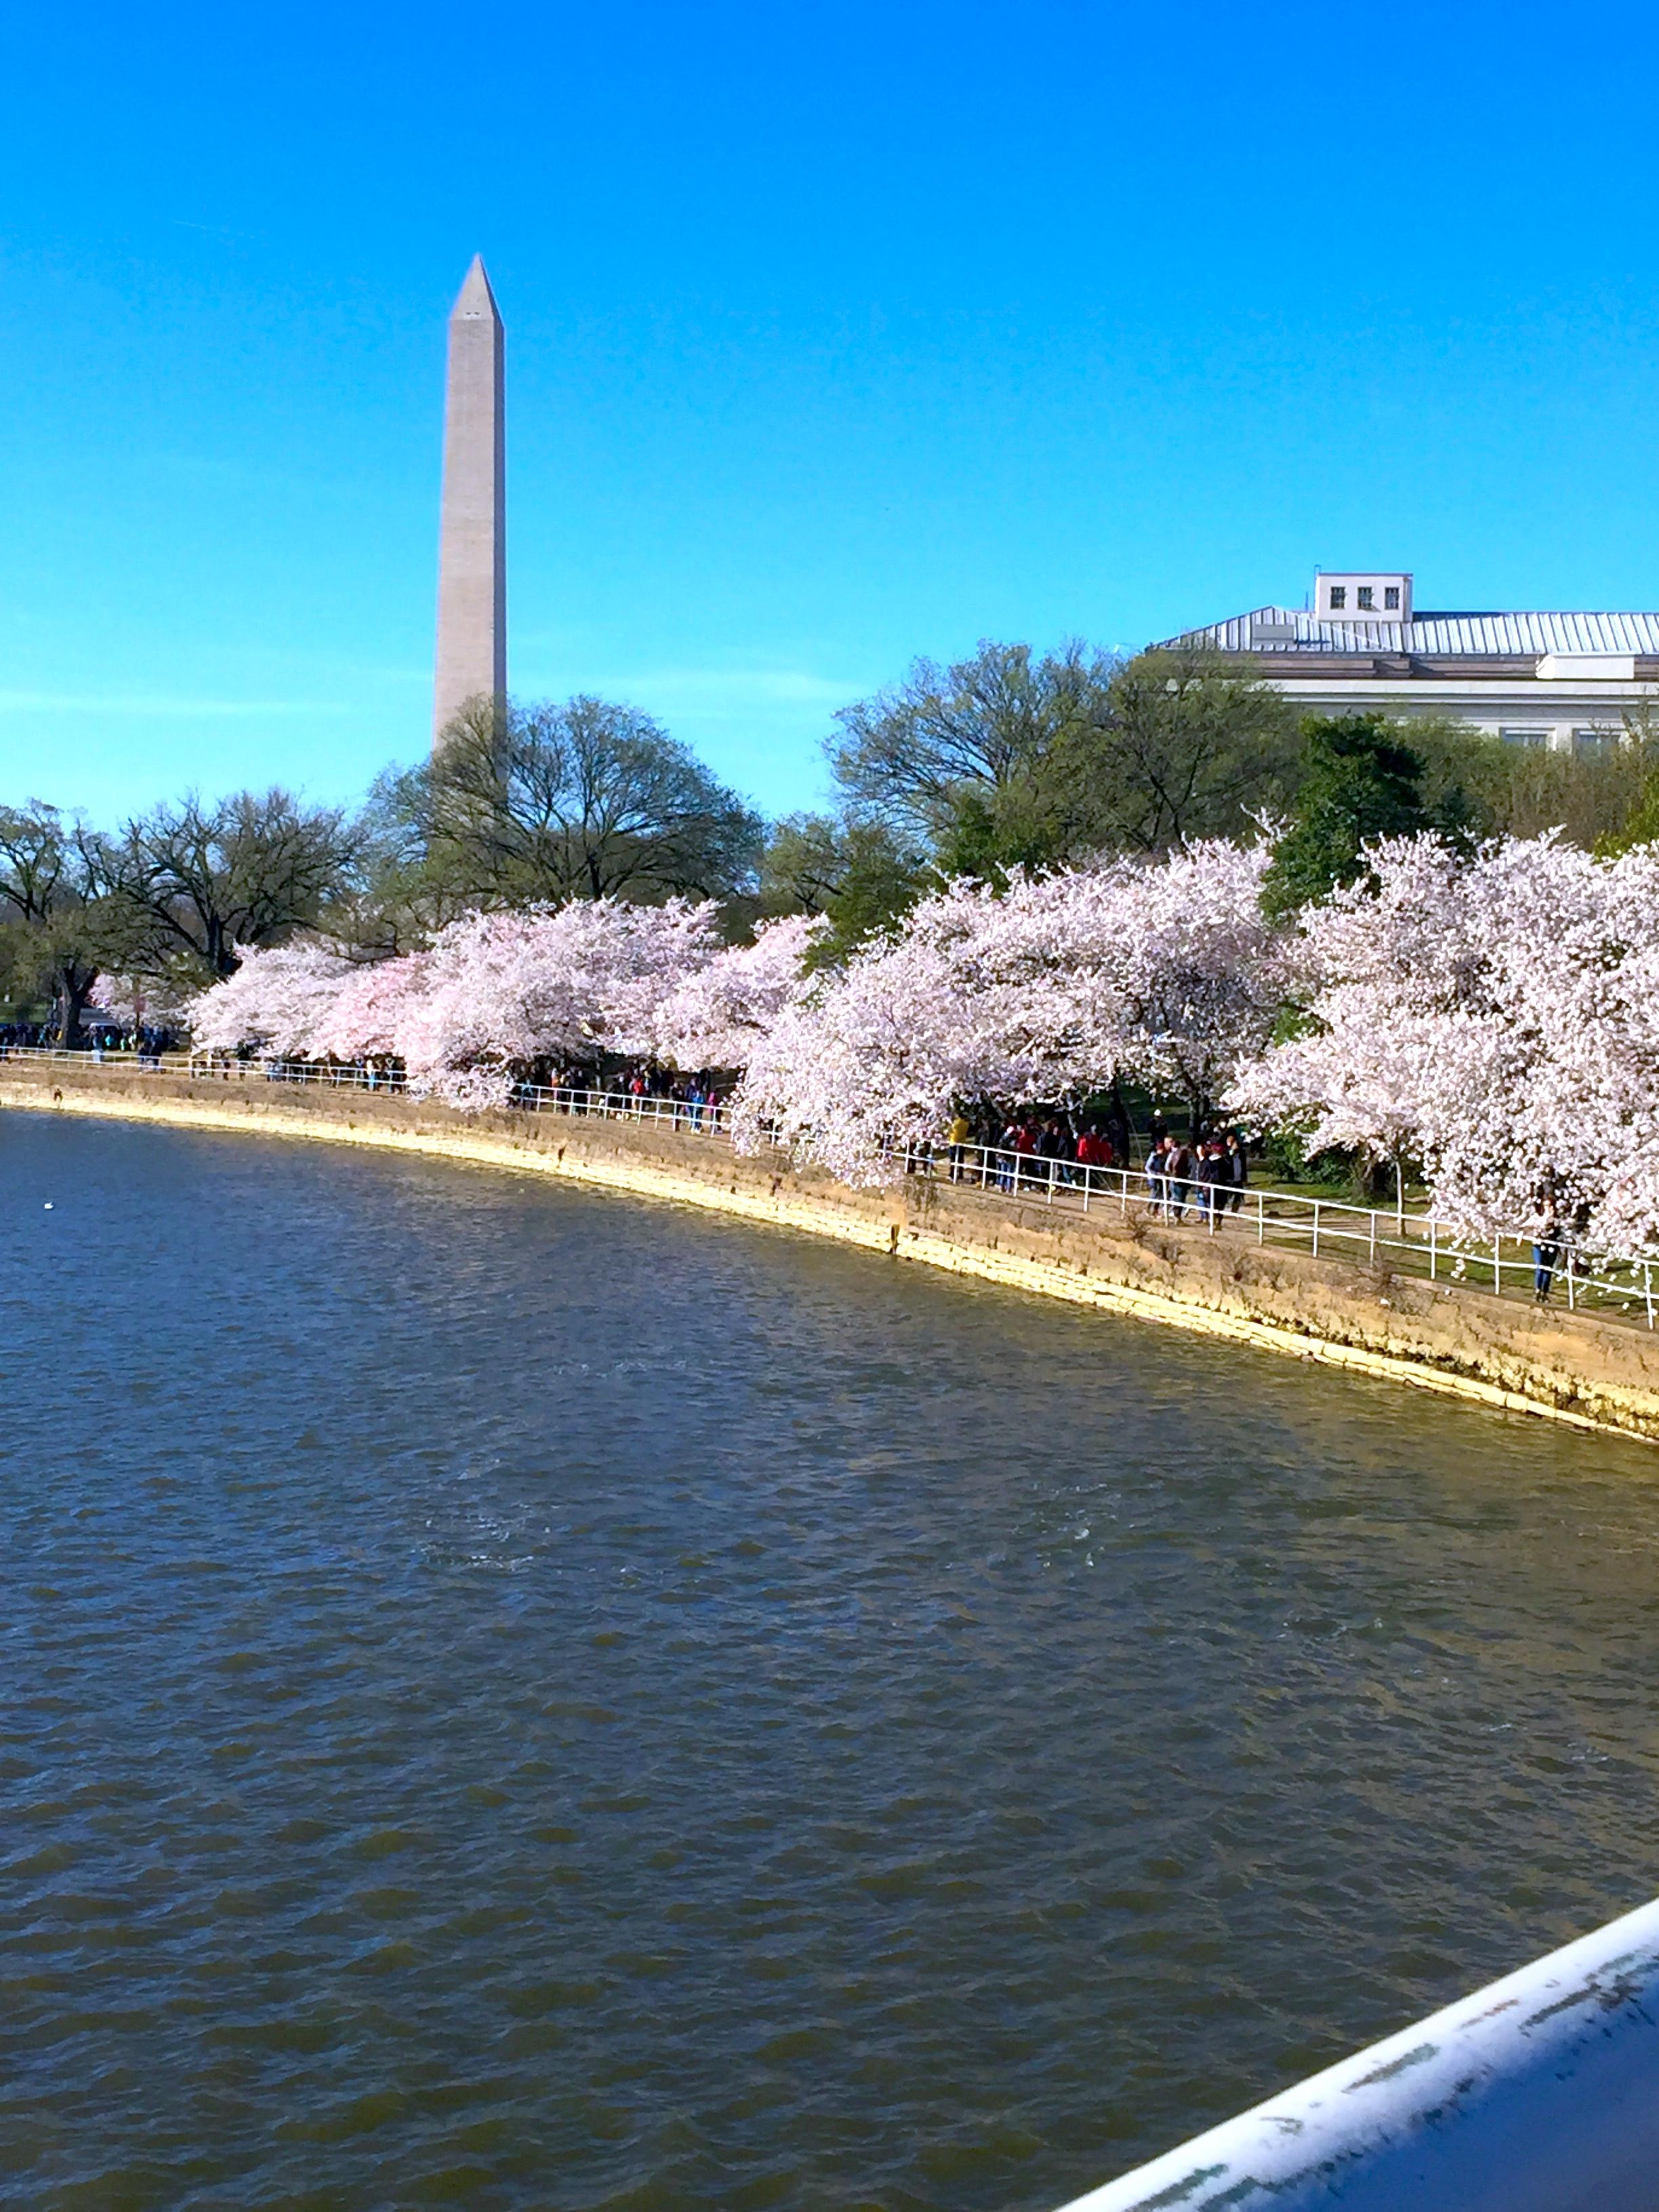 At Washington on April 1, 2019年4月1日攝於華盛頓